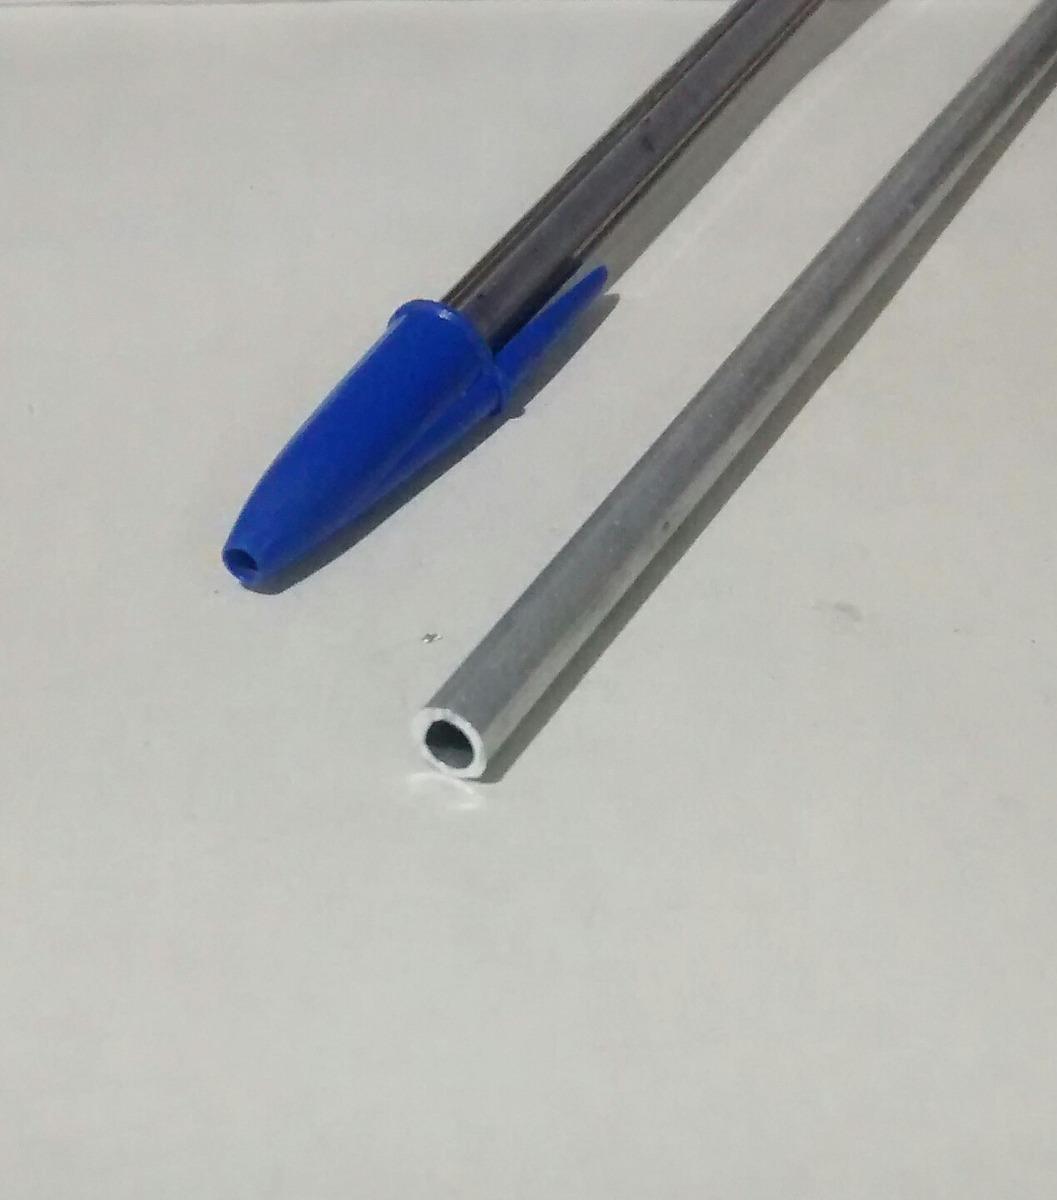 Tubo aluminio redondo 1 4 6 35mm x 1 00mm c 99cm r 9 - Tubo de aluminio redondo ...